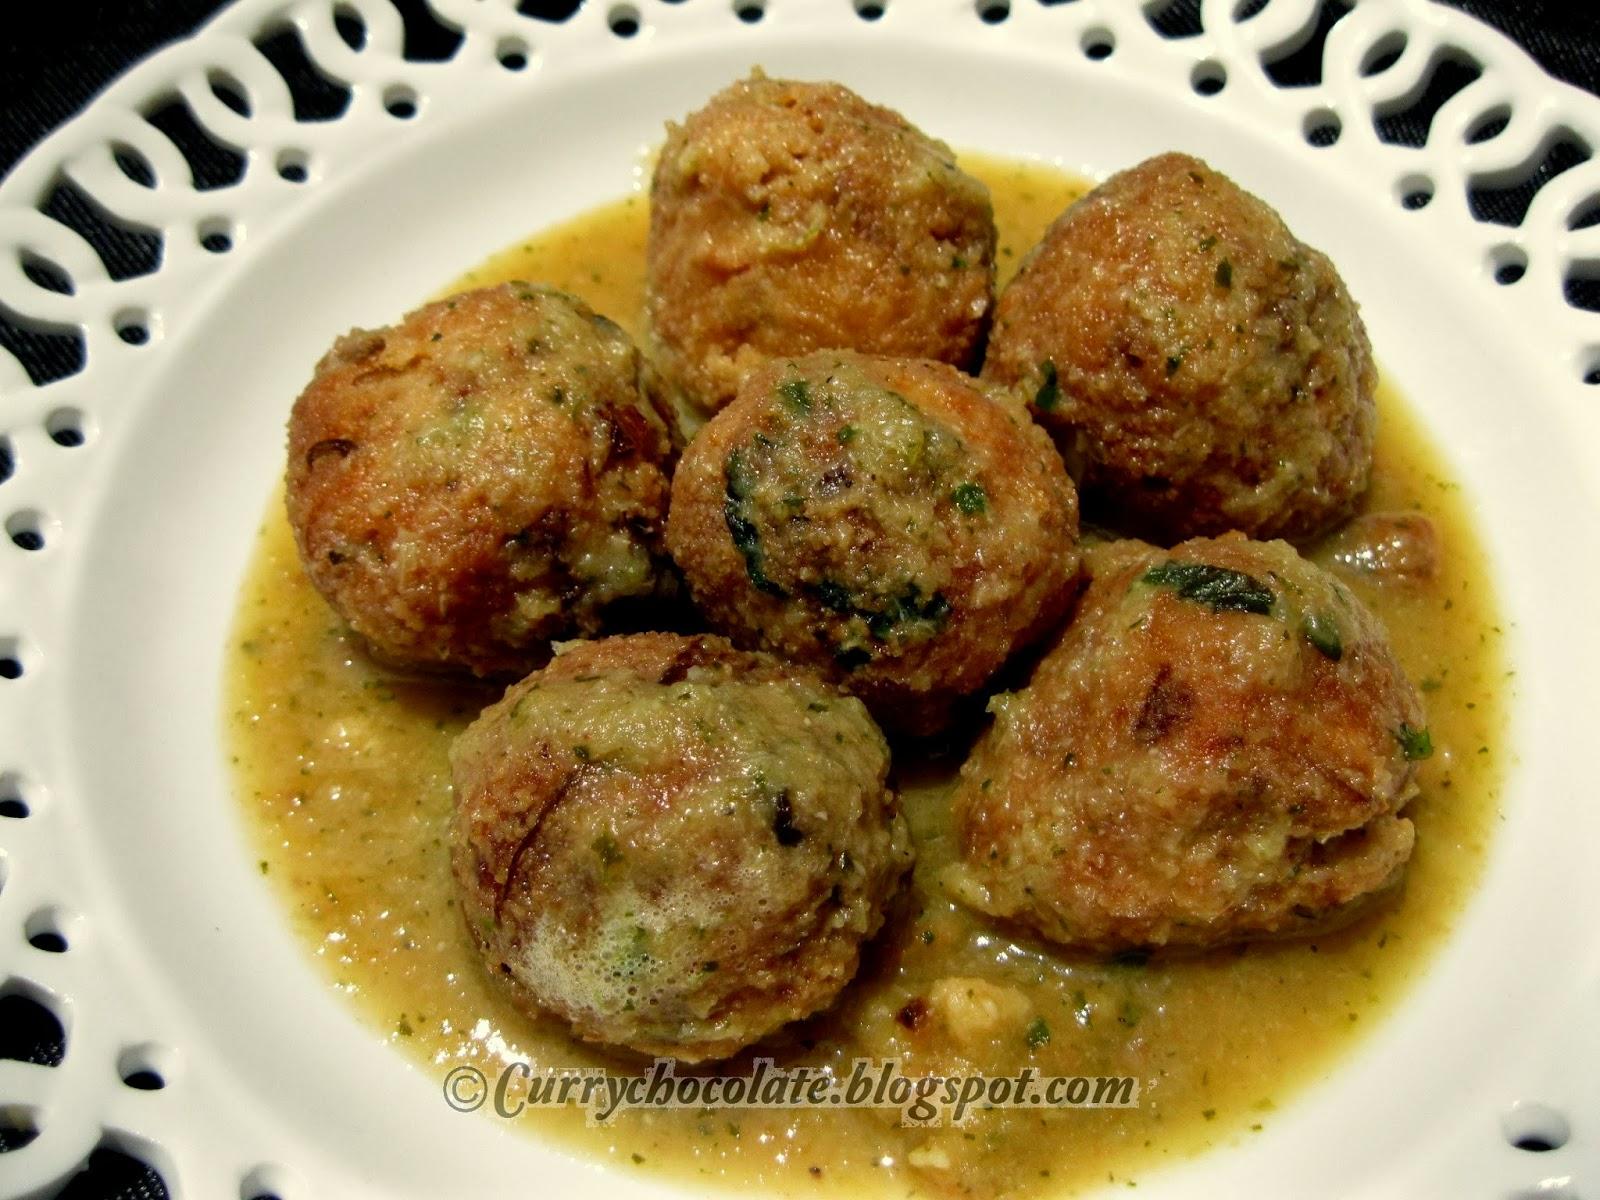 Curry y chocolate alb ndigas de verdura con queso for Albondigas de verduras